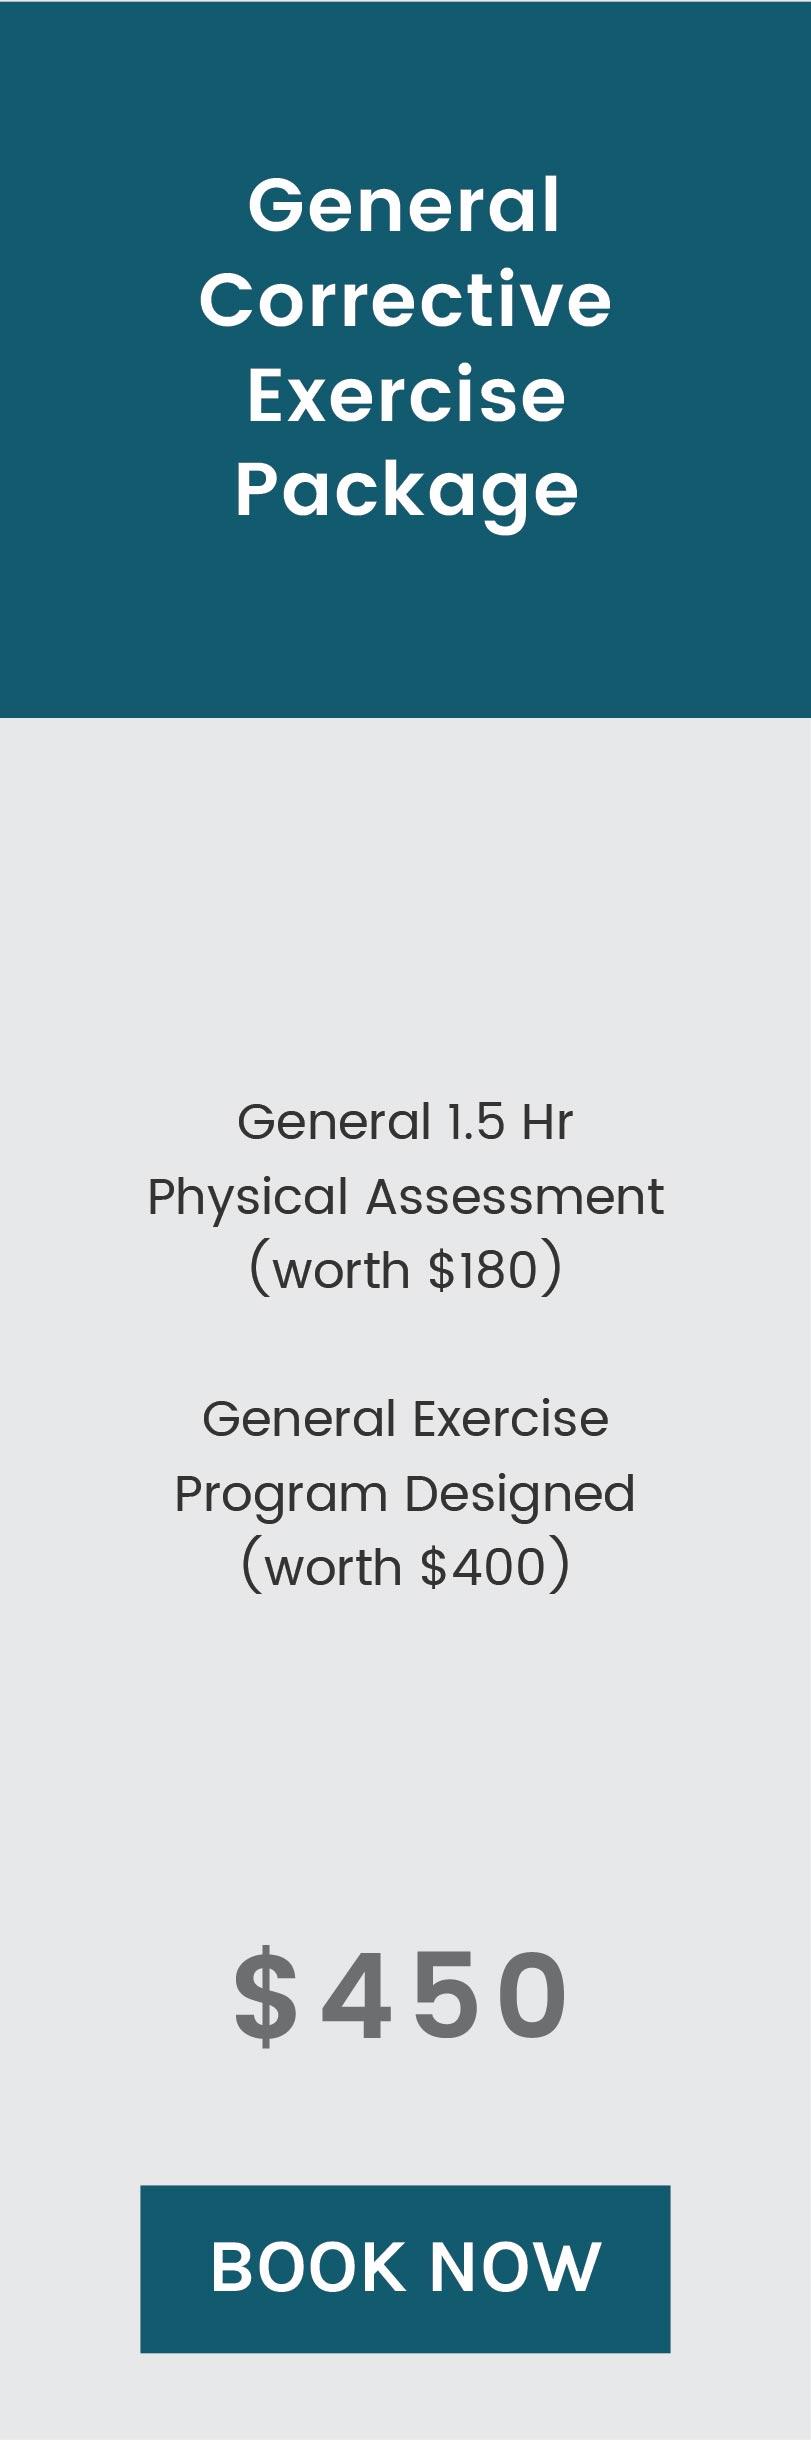 rhythm-health-package-graphic1-04.jpg